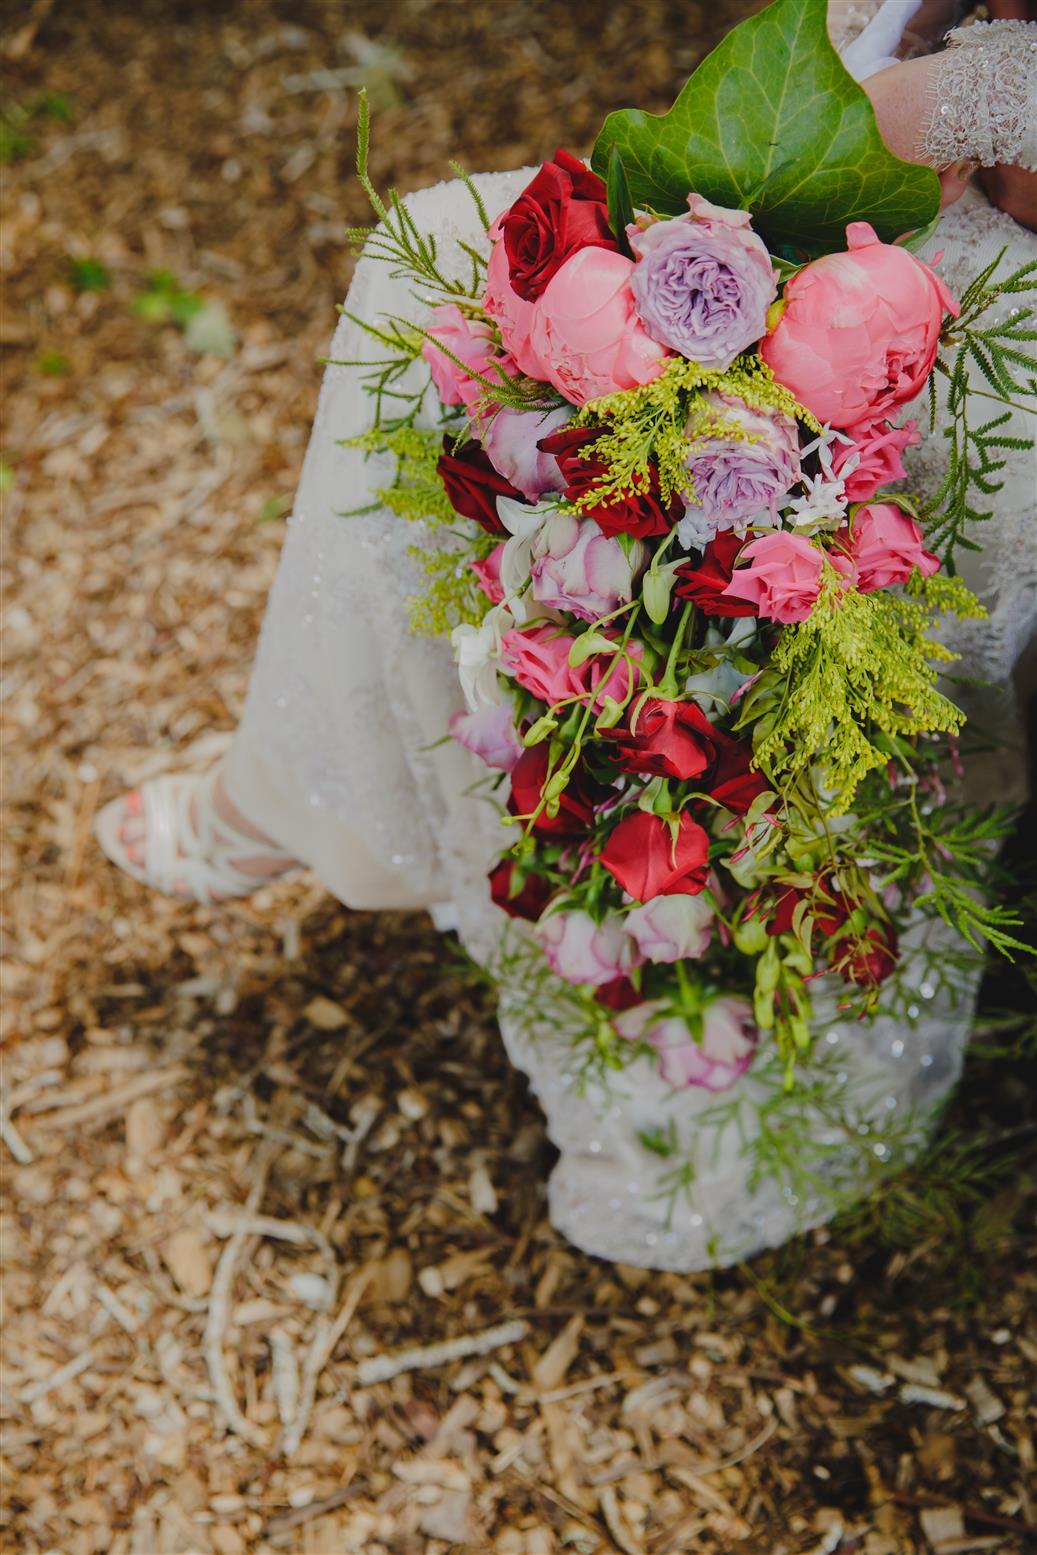 Trailing Bouquet - An Elegant Spring Vintage Wedding